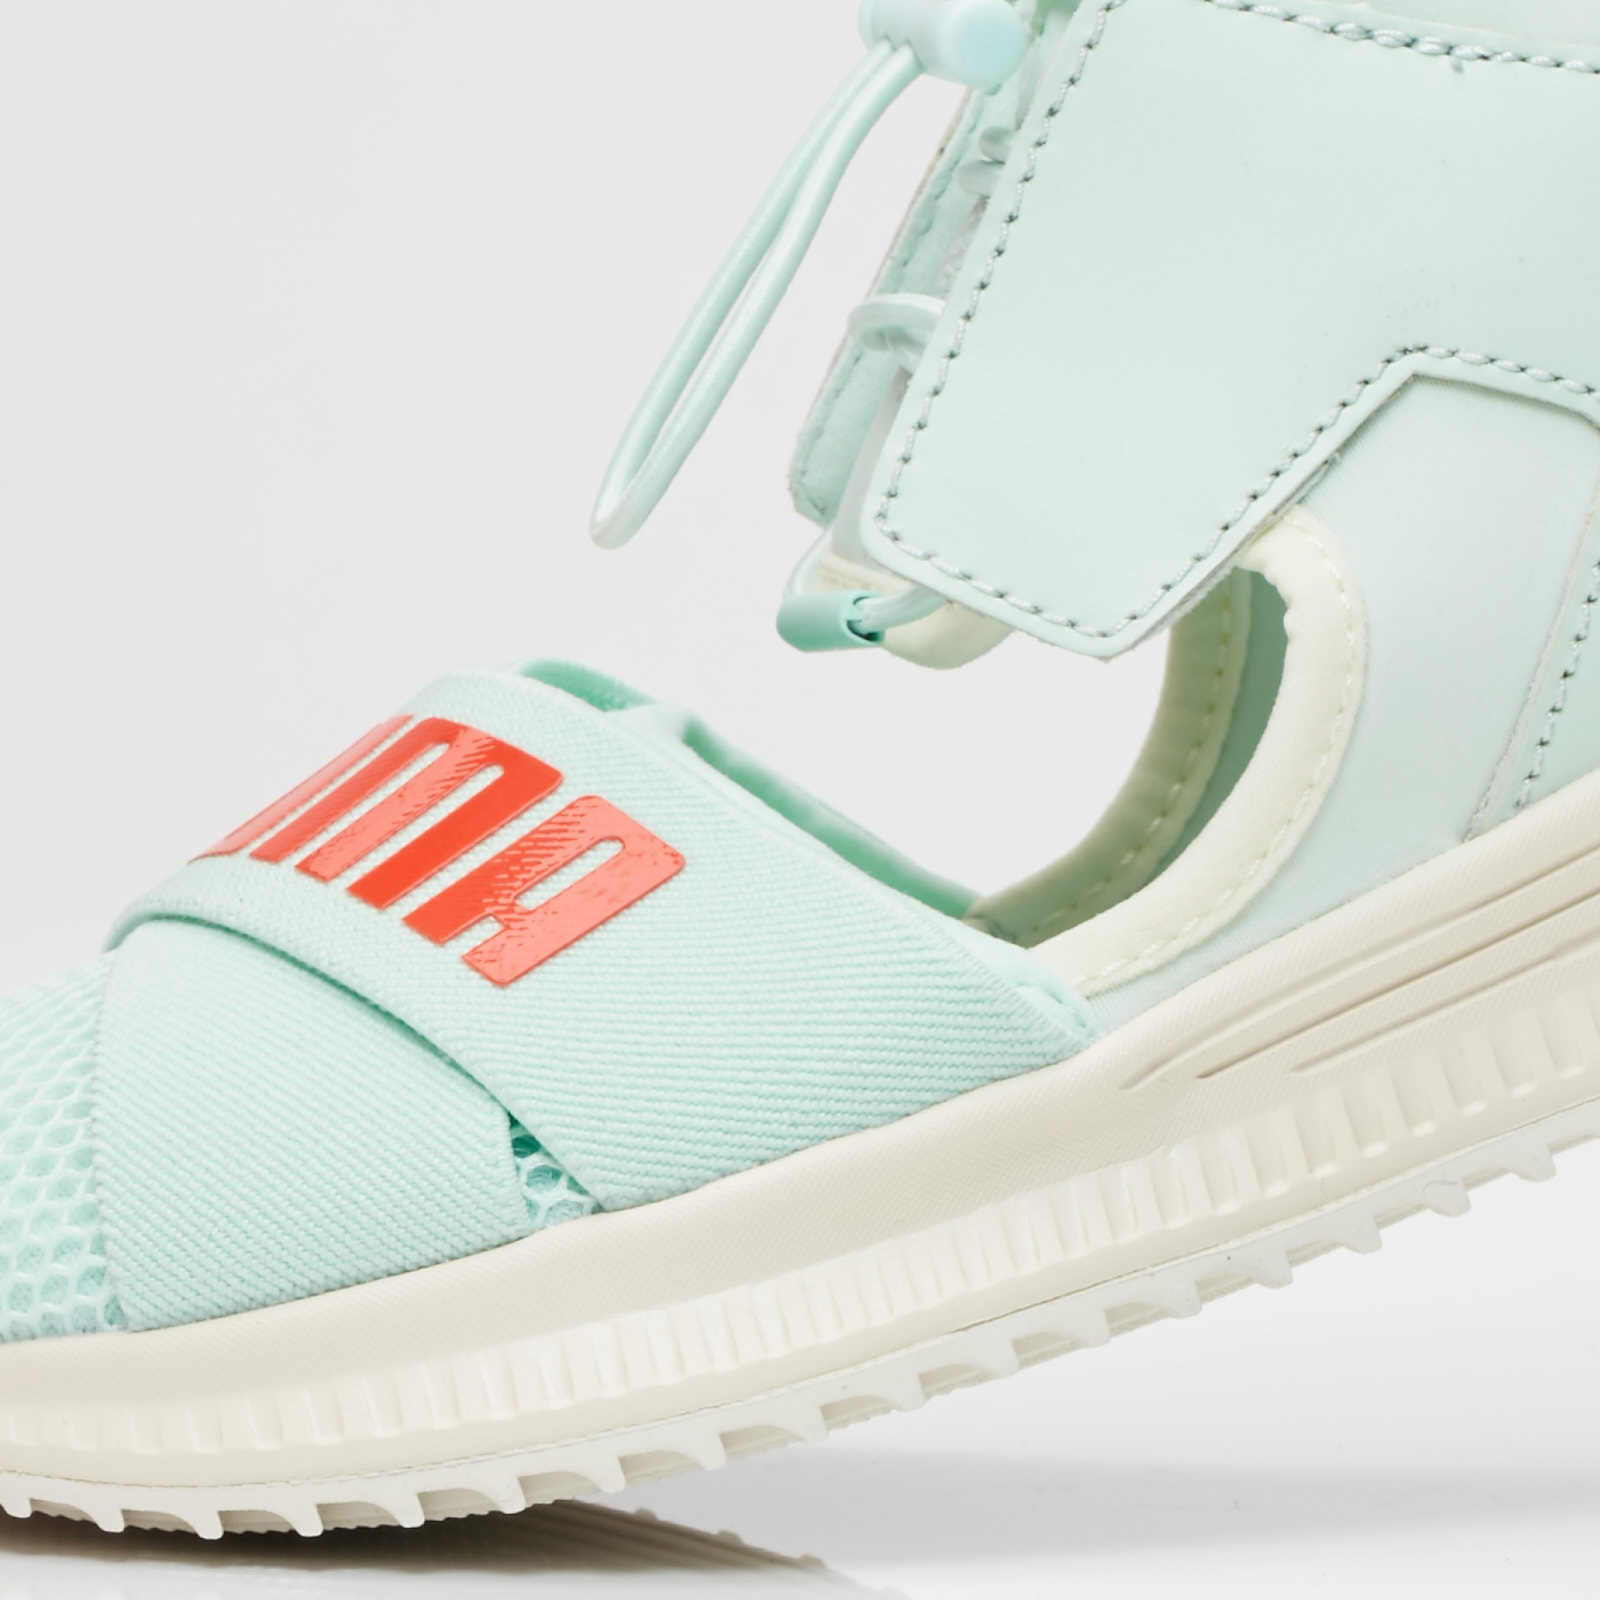 promo code 695f6 71006 Puma Fenty Avid Wns - 367683-05 - Sneakersnstuff | sneakers ...